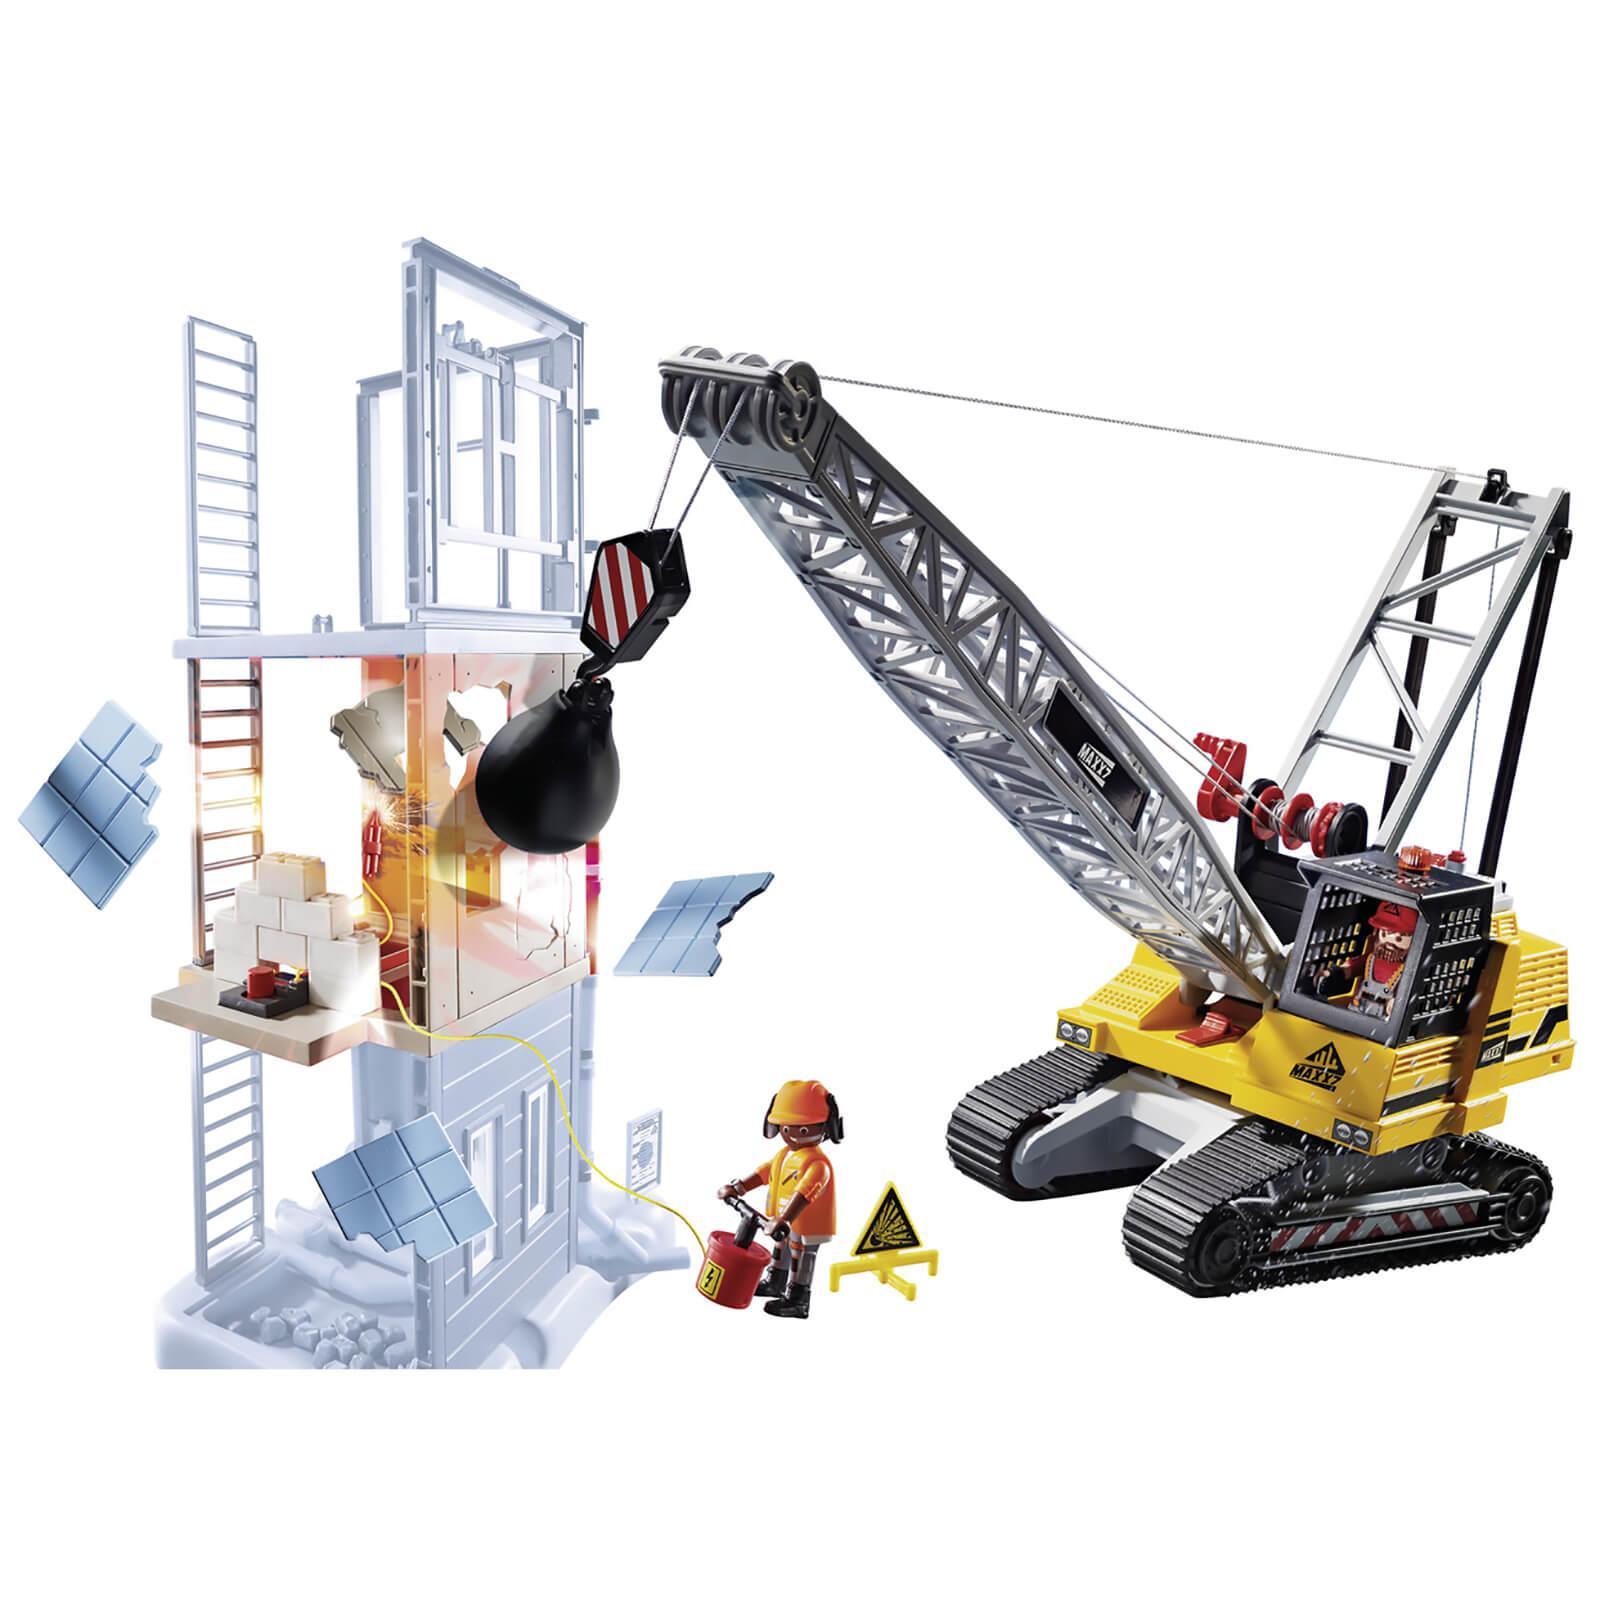 Playmobil City Action Demolition Crane (70442)